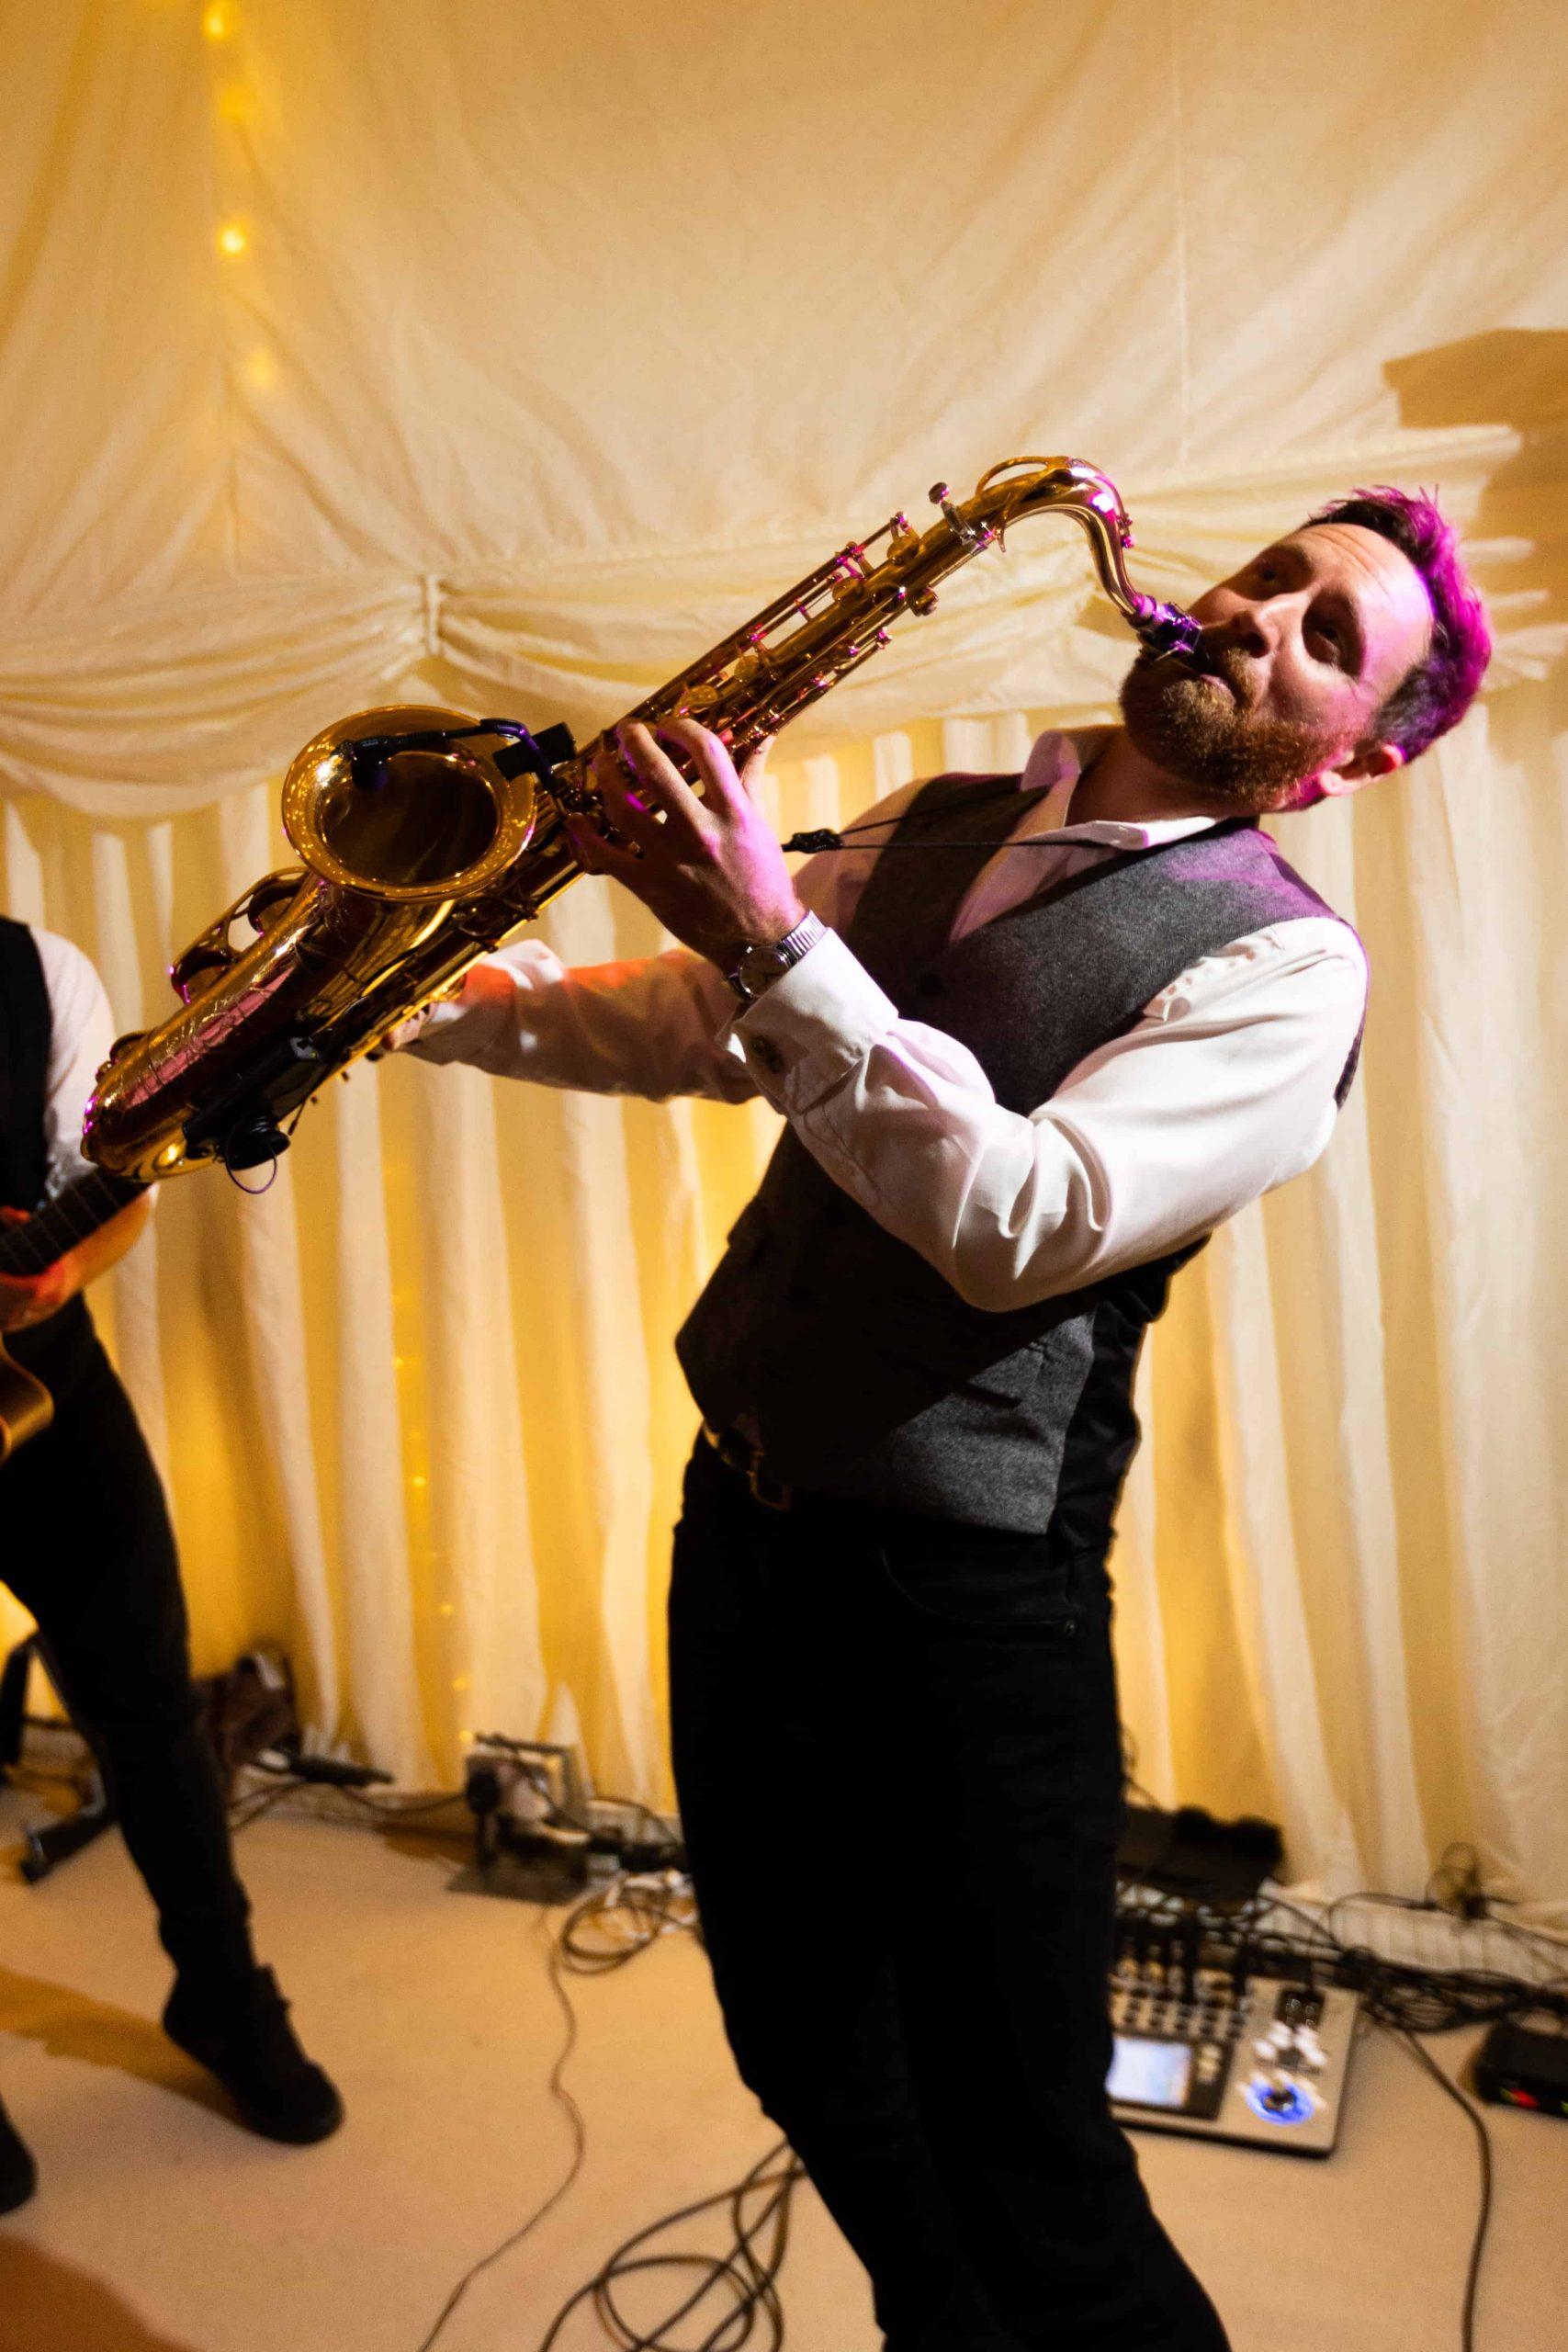 The Wildermen sax player